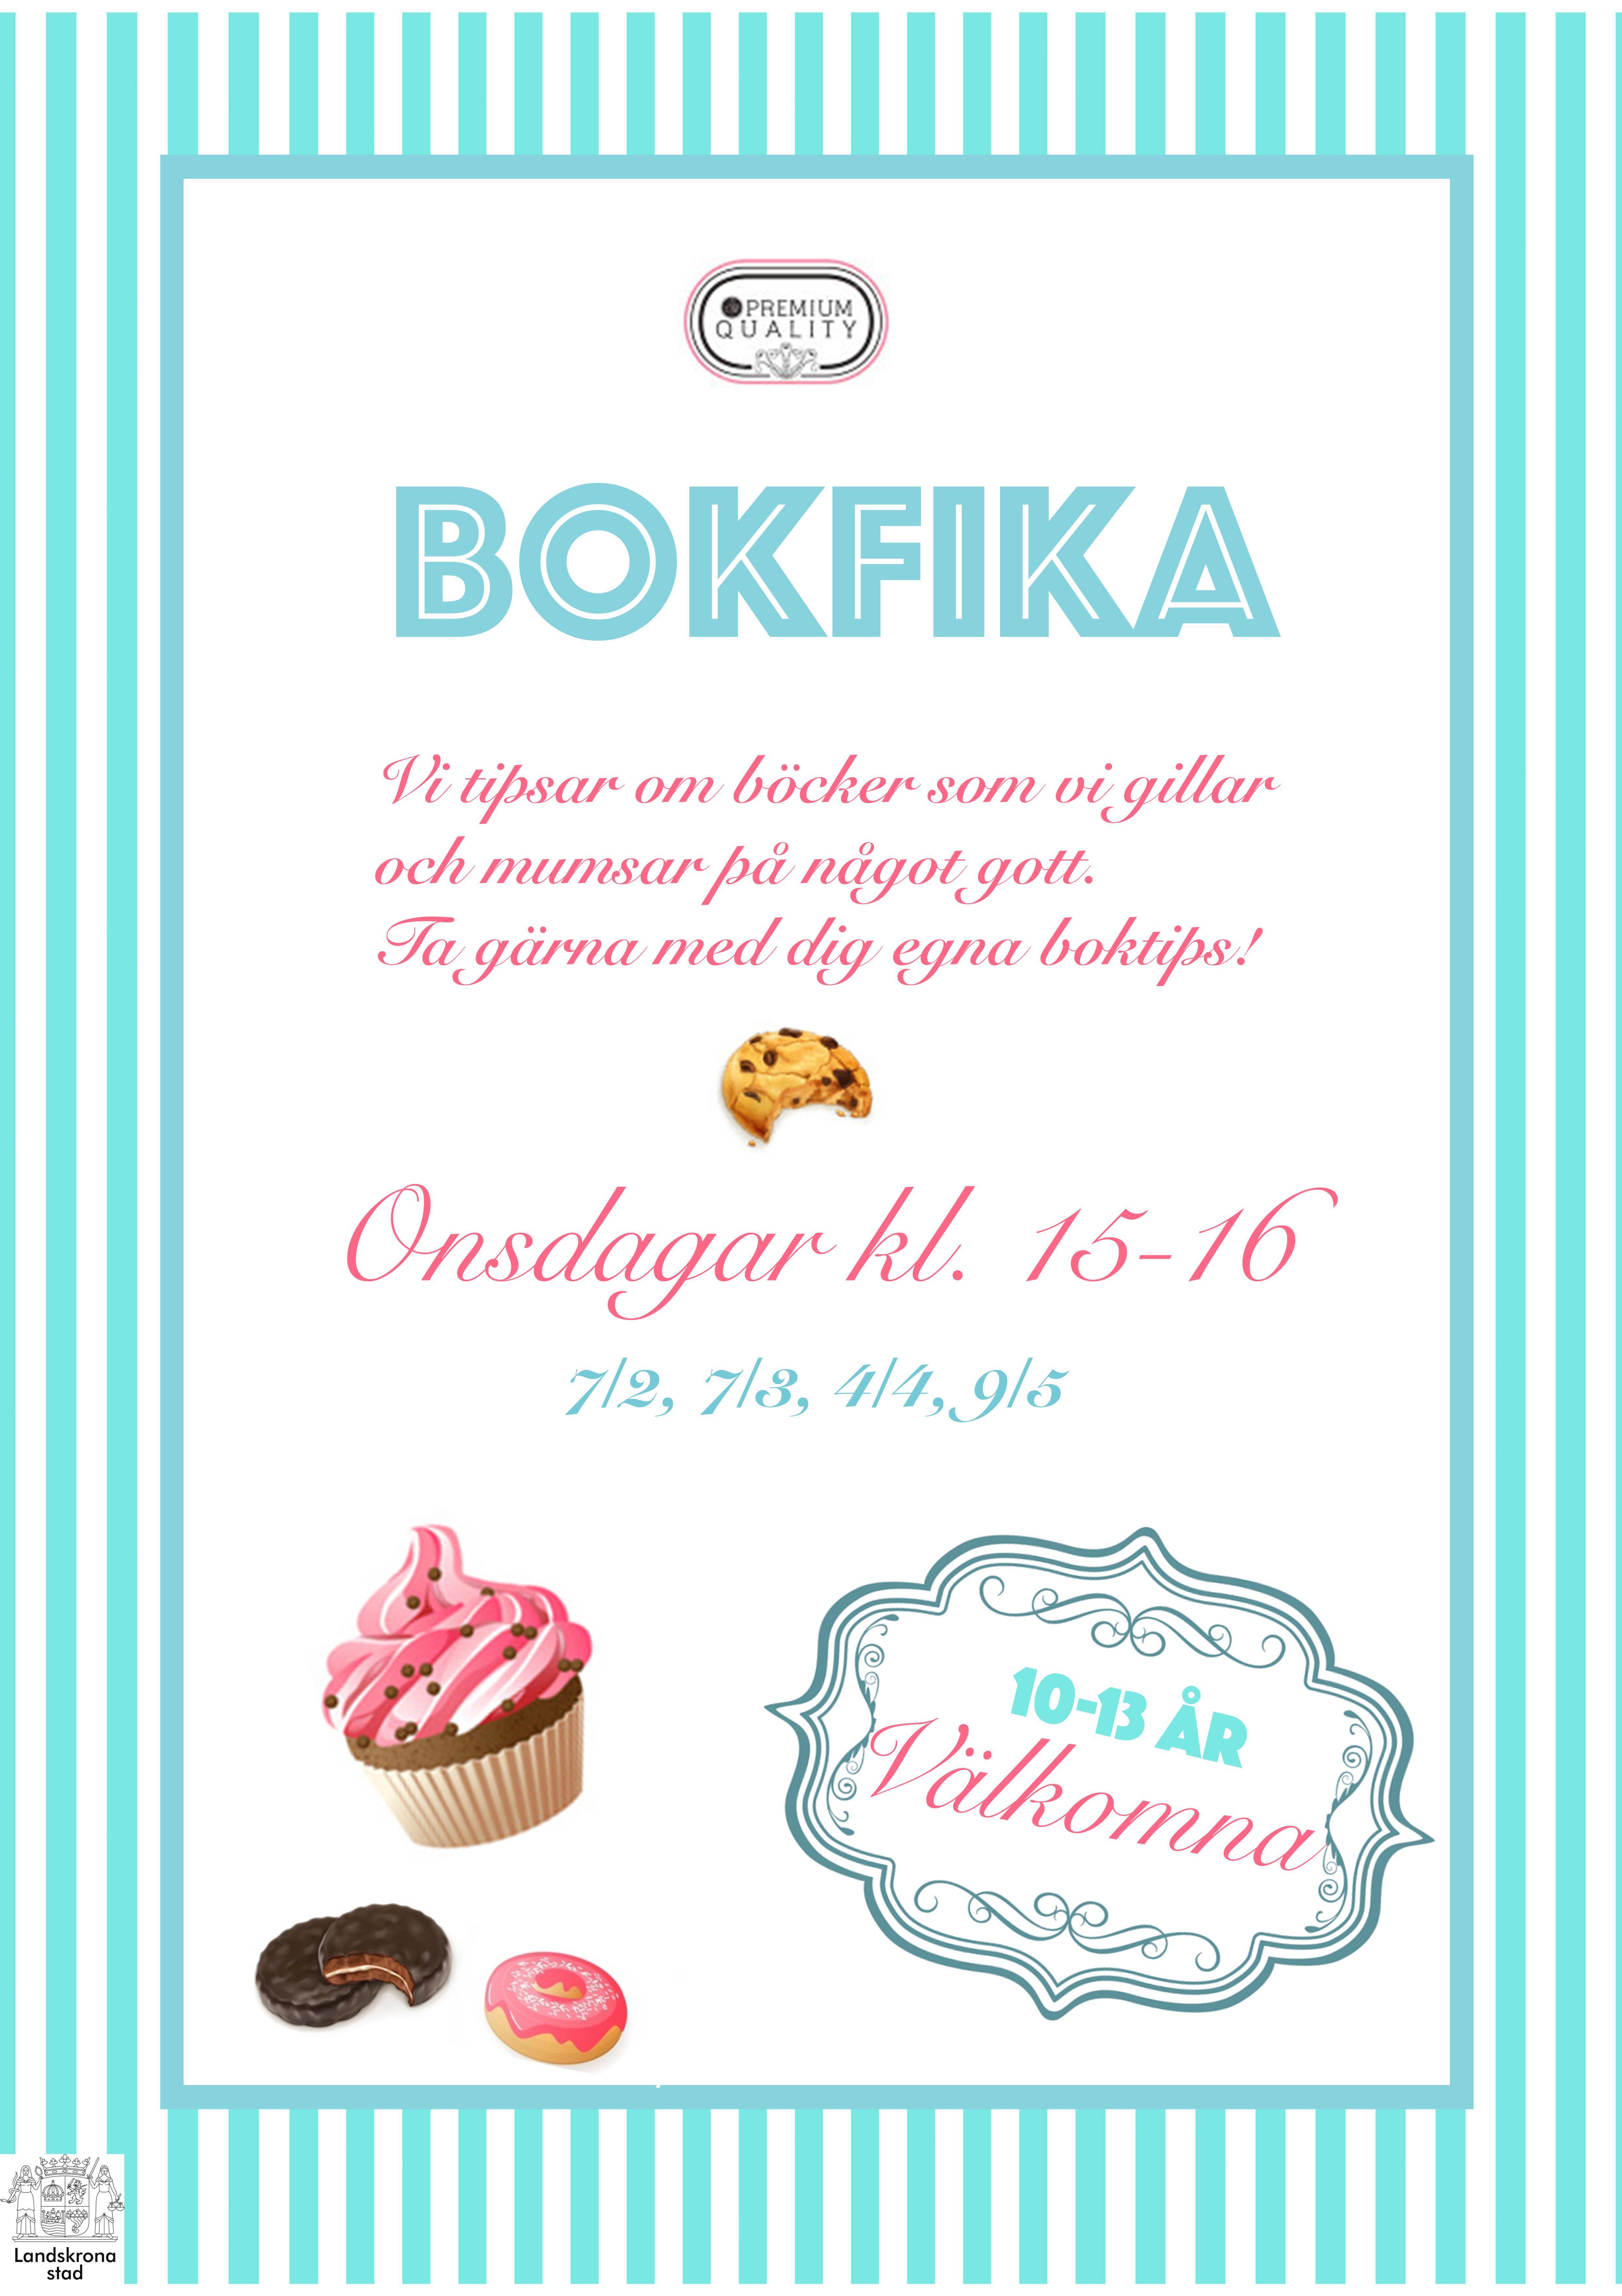 Bokfika